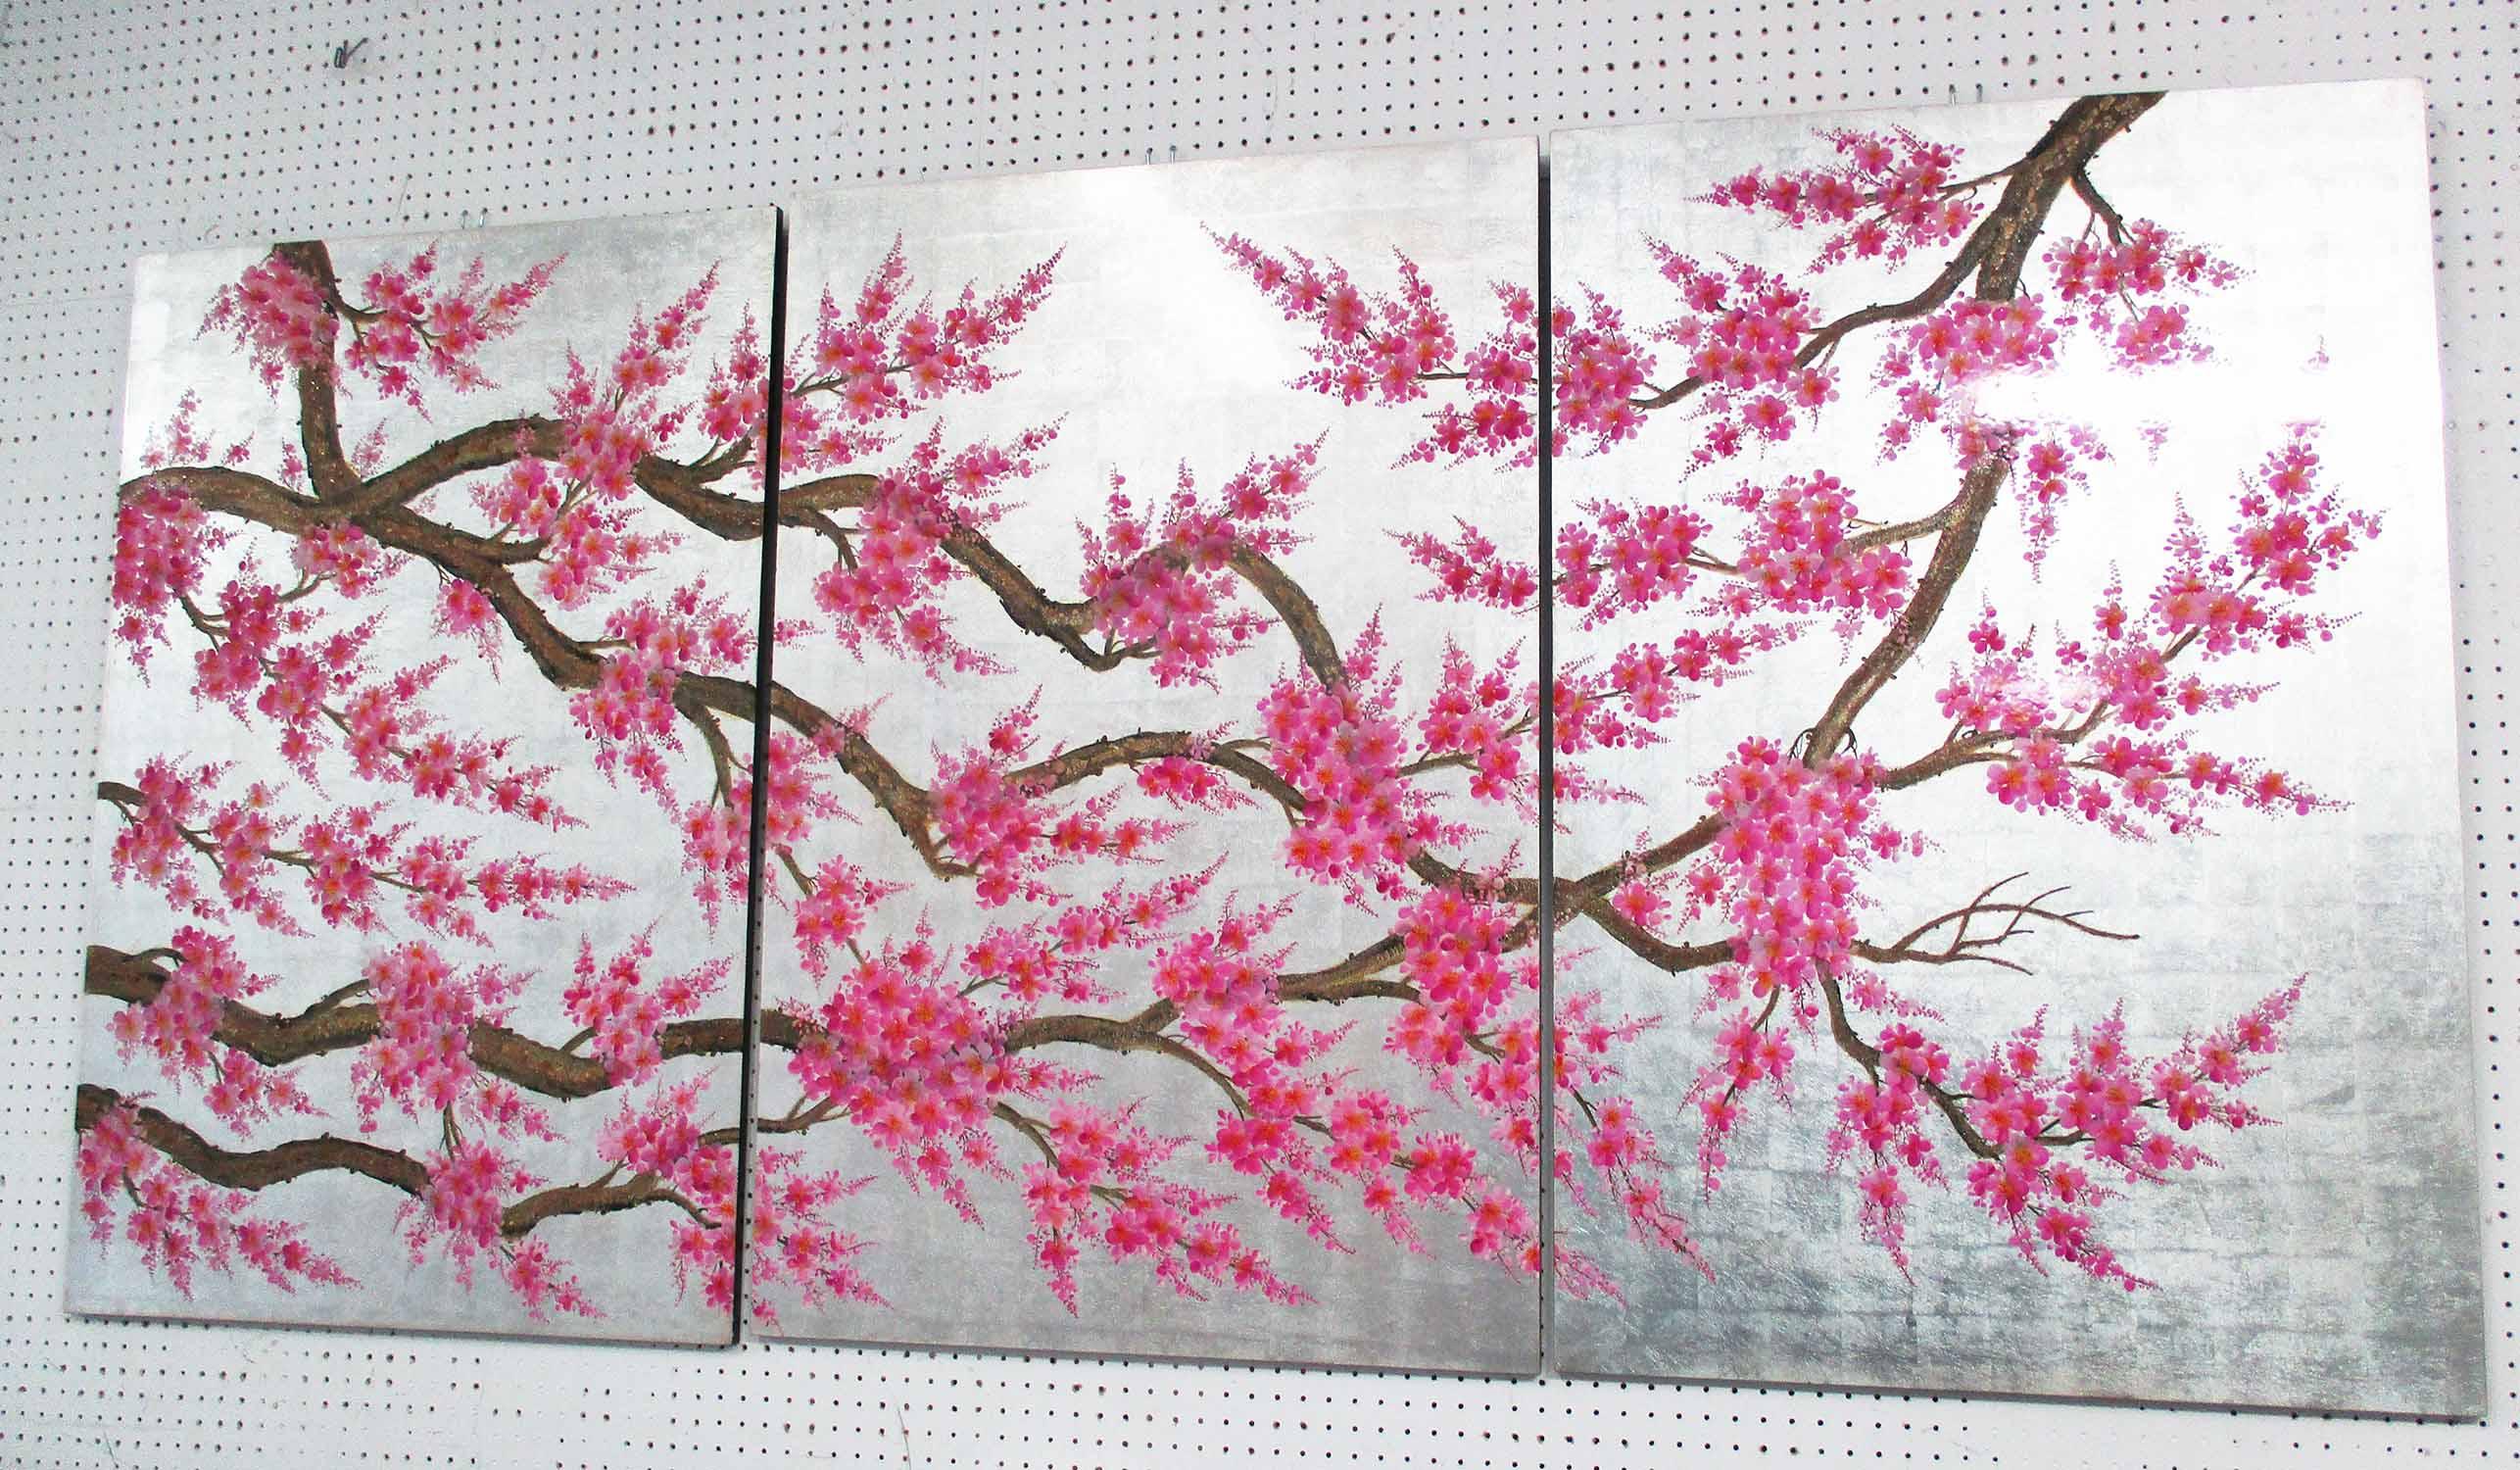 Lot 120 - SAKURA CHERRY BLOSSOM PANELS, three, lacquered, each panel 60cm x 90cm.